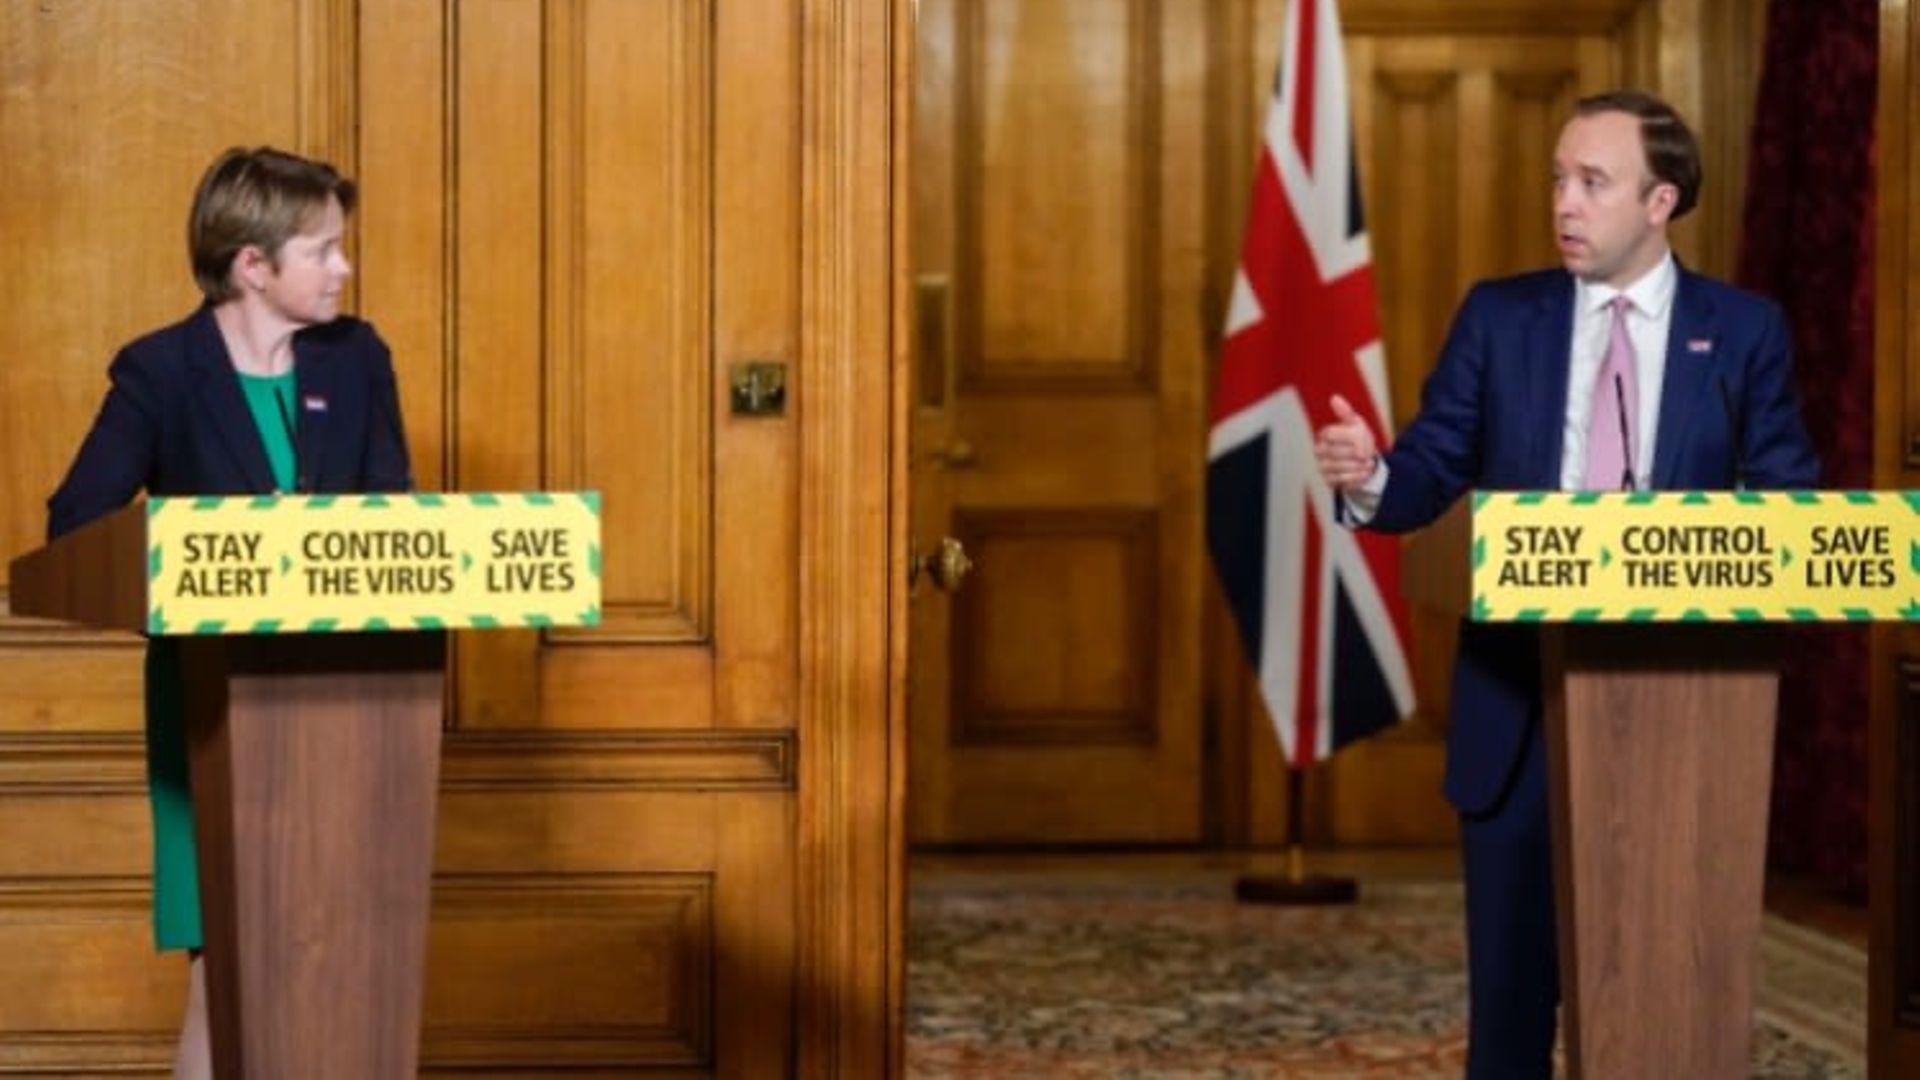 Dido Harding and Matt Hancock at a Number 10 press conference - Credit: Downing Street/PA